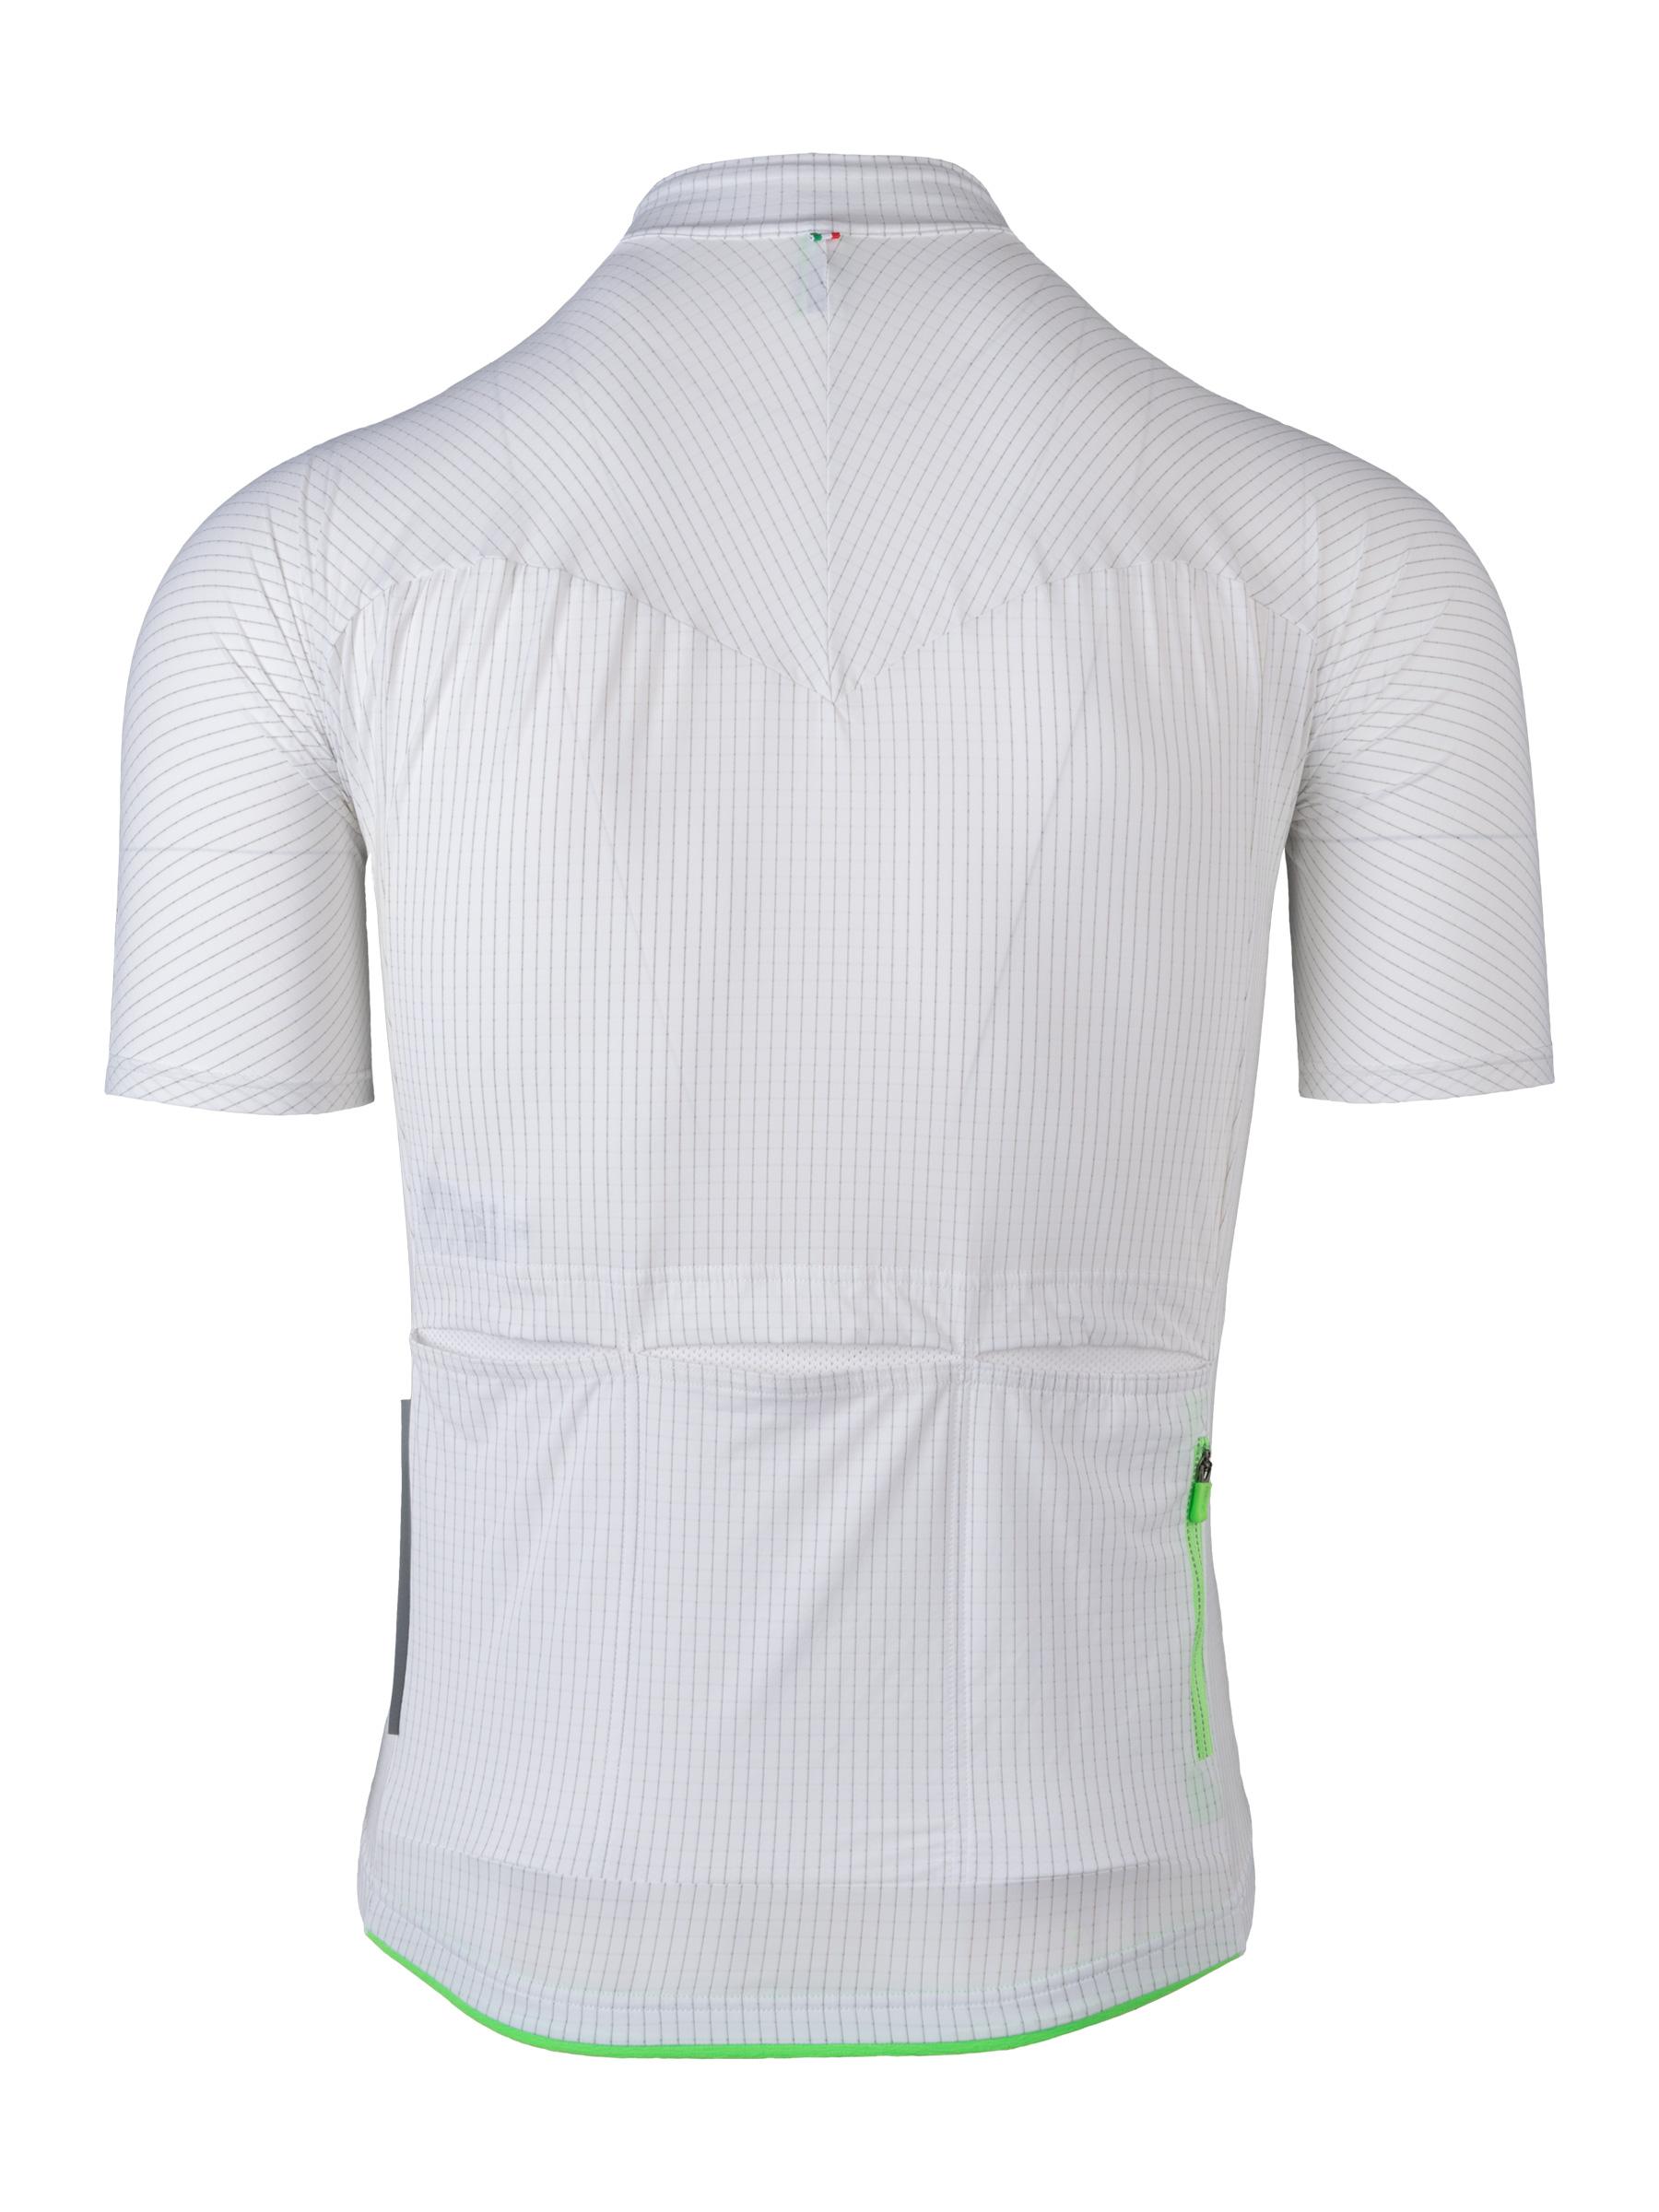 Maillot Jersey short sleeve L1 Pinstripe Blanco